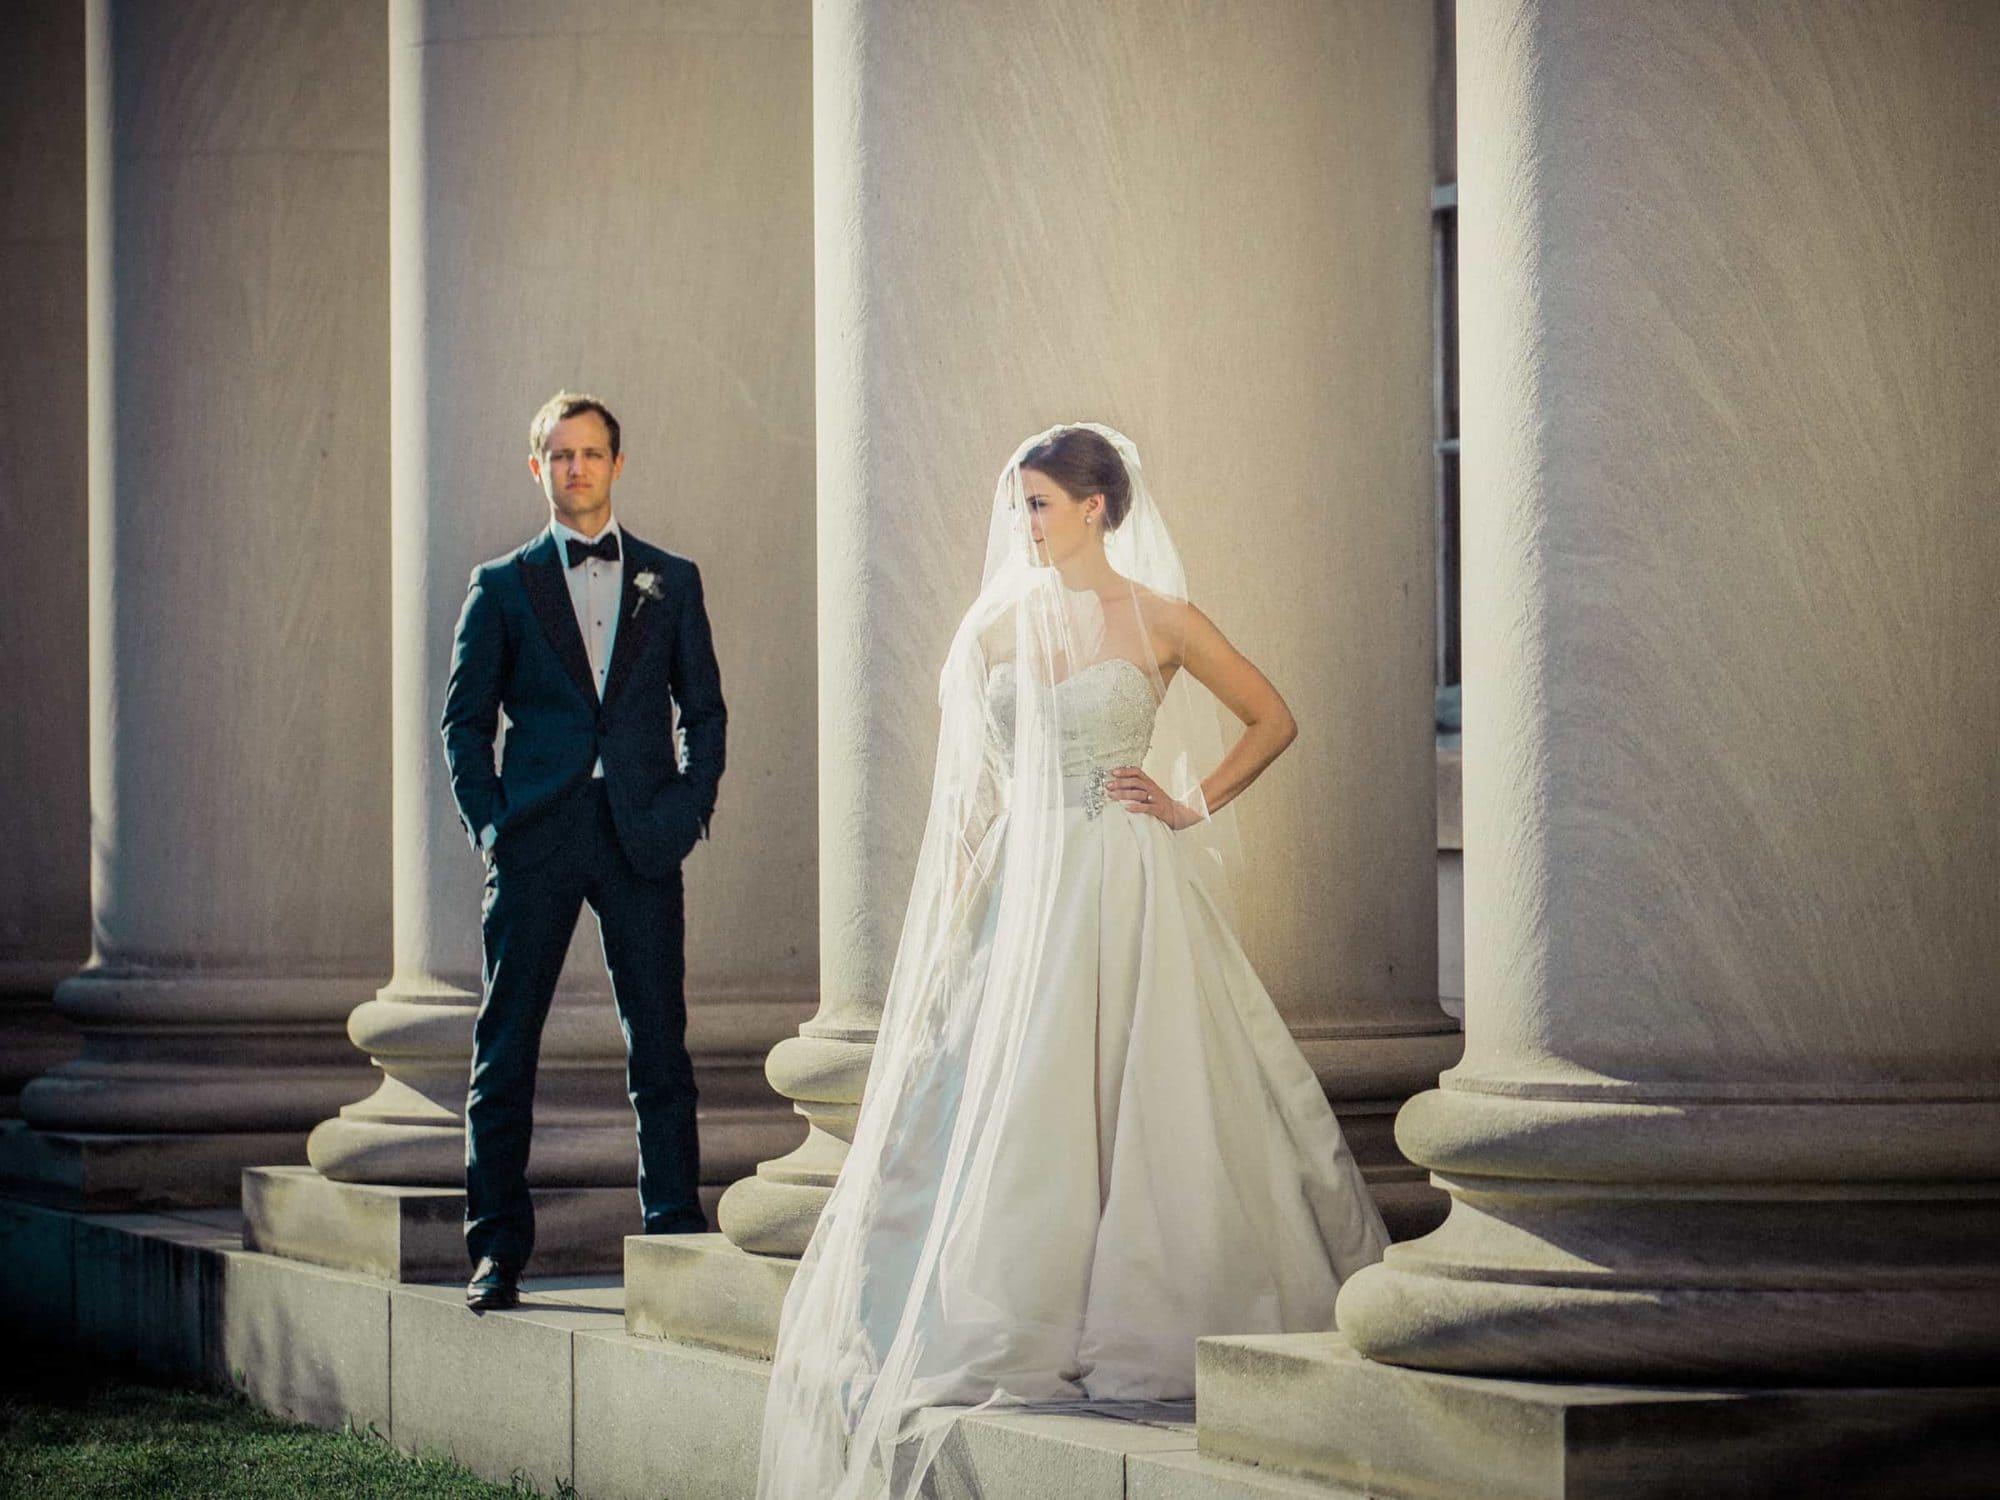 Durham-Post-Office-Wedding-Photos-Couple-Columns-1